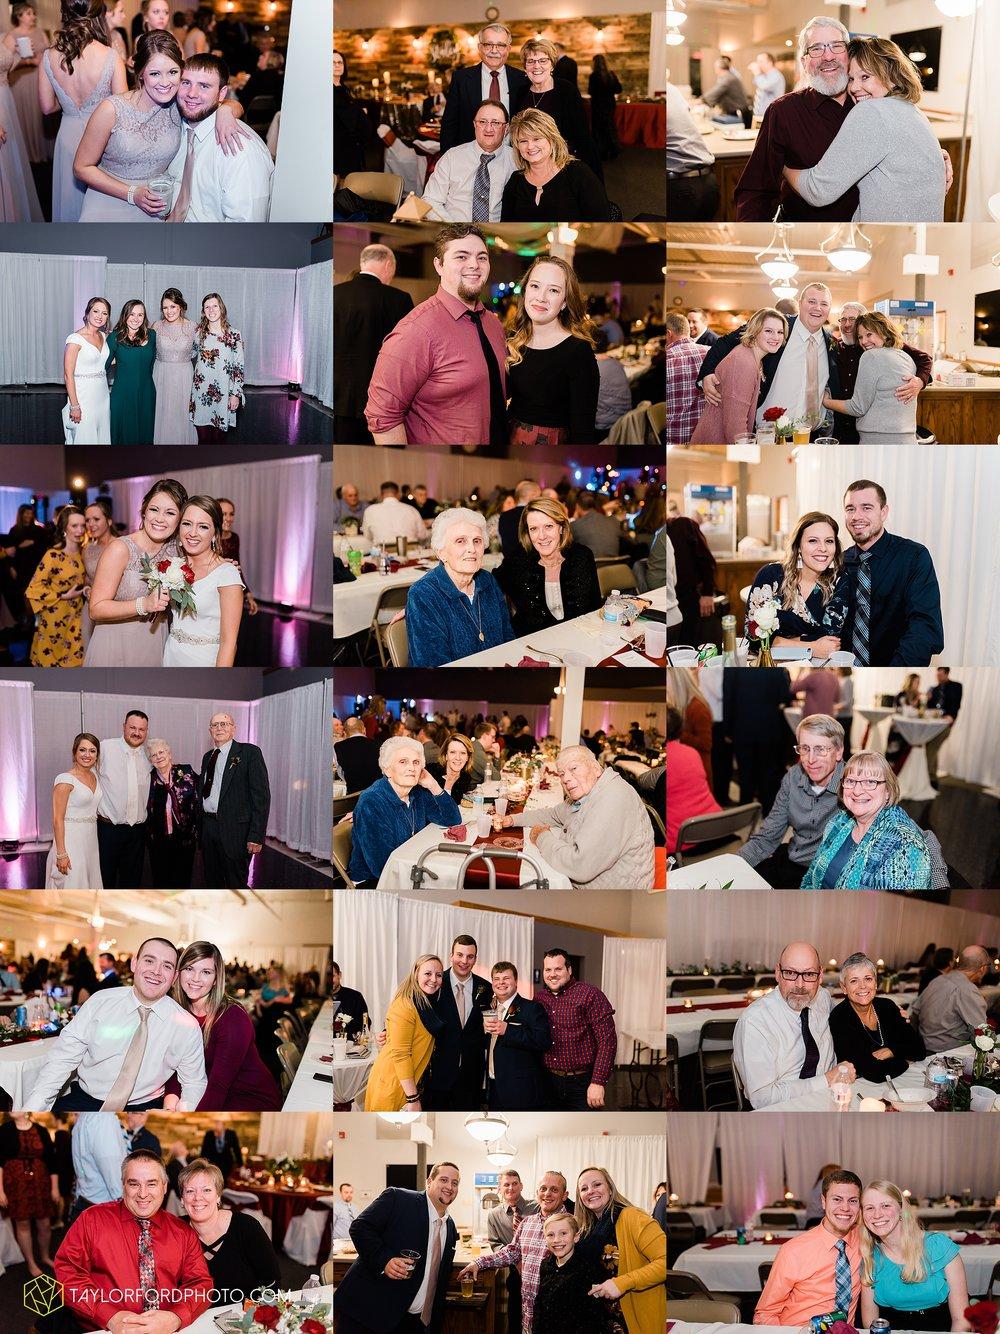 brooke-jacob-staley-van-wert-ohio-farm-wedding-saint-marks-church-november-classic-citizens-senior-center-photographer-taylor-ford-hirschy-photographer_1815.jpg